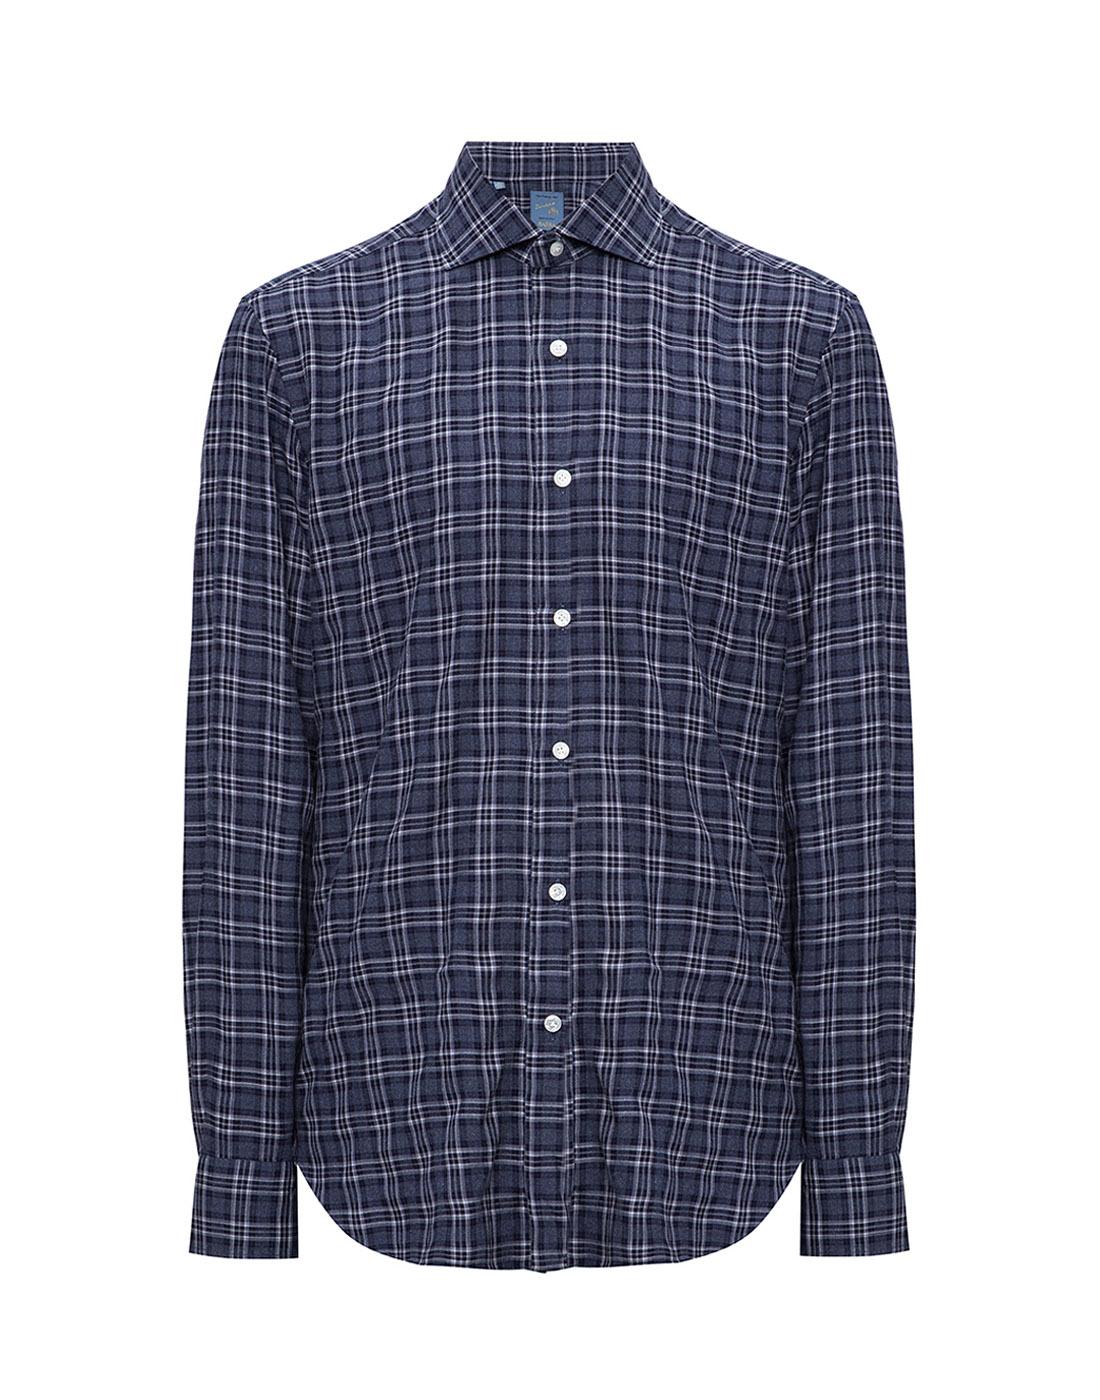 Мужская синяя рубашка в клетку Barba SD2U133603601X-1